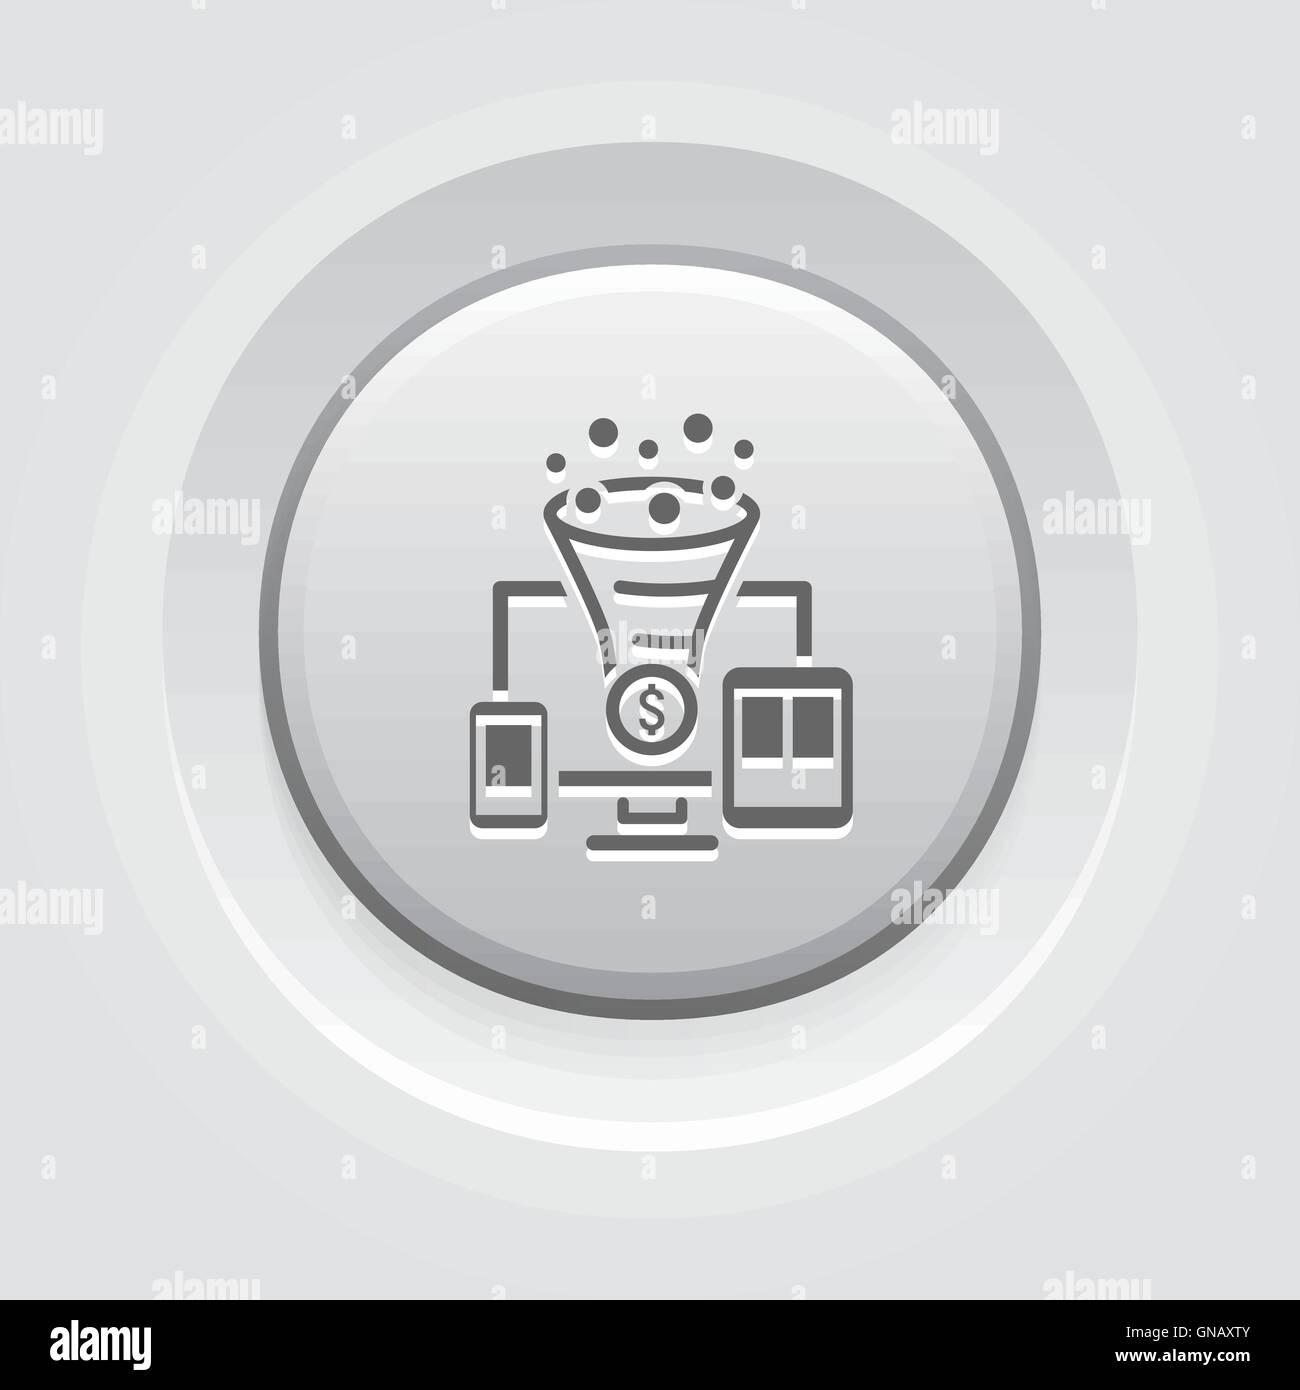 Conversion Rate Optimisation Icon - Stock Image